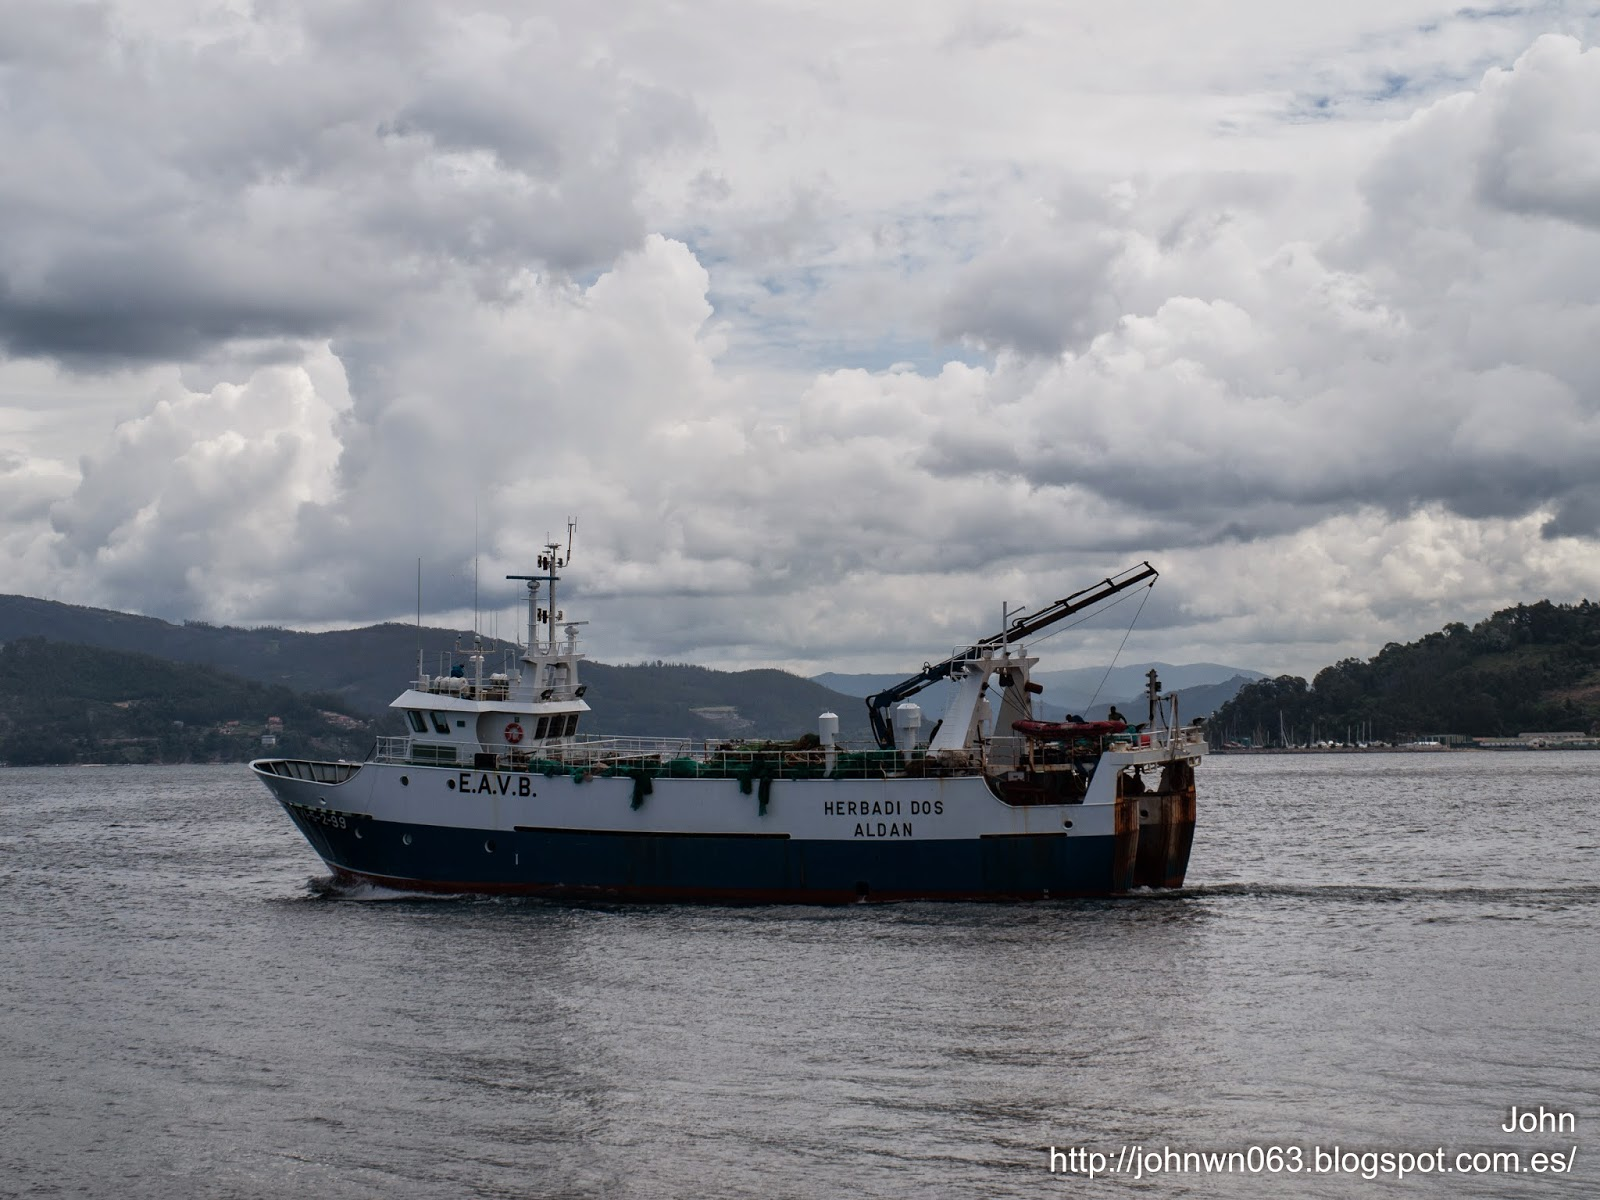 fotos de barcos, imagenes de barcos, herbadi dos, arrastrero, trawler, valiña, vigo